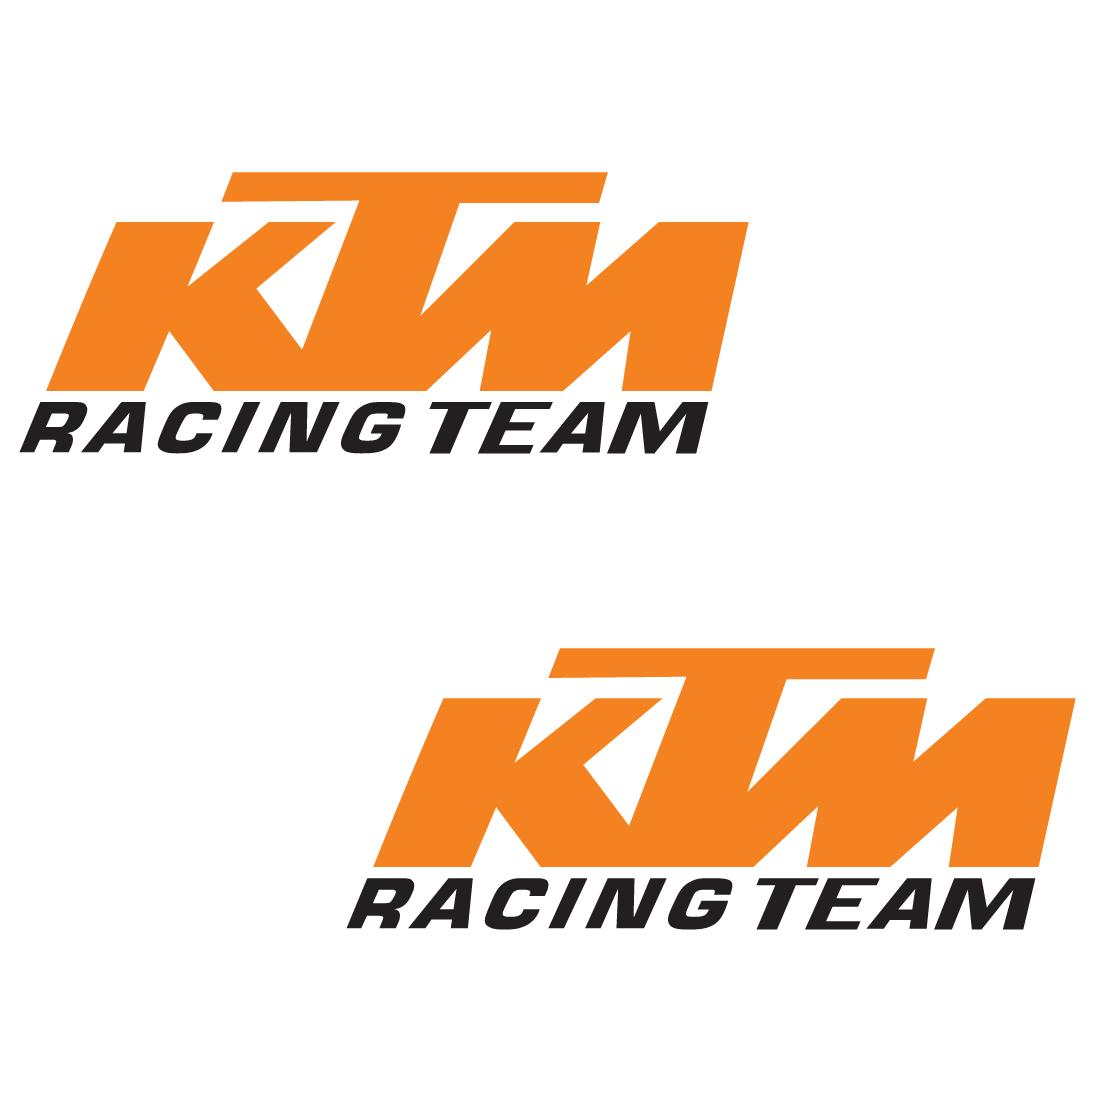 2u X Ktm Racing Team Bikes Decal Vinyl Stickers Racing Team Ktm Vinyl Sticker